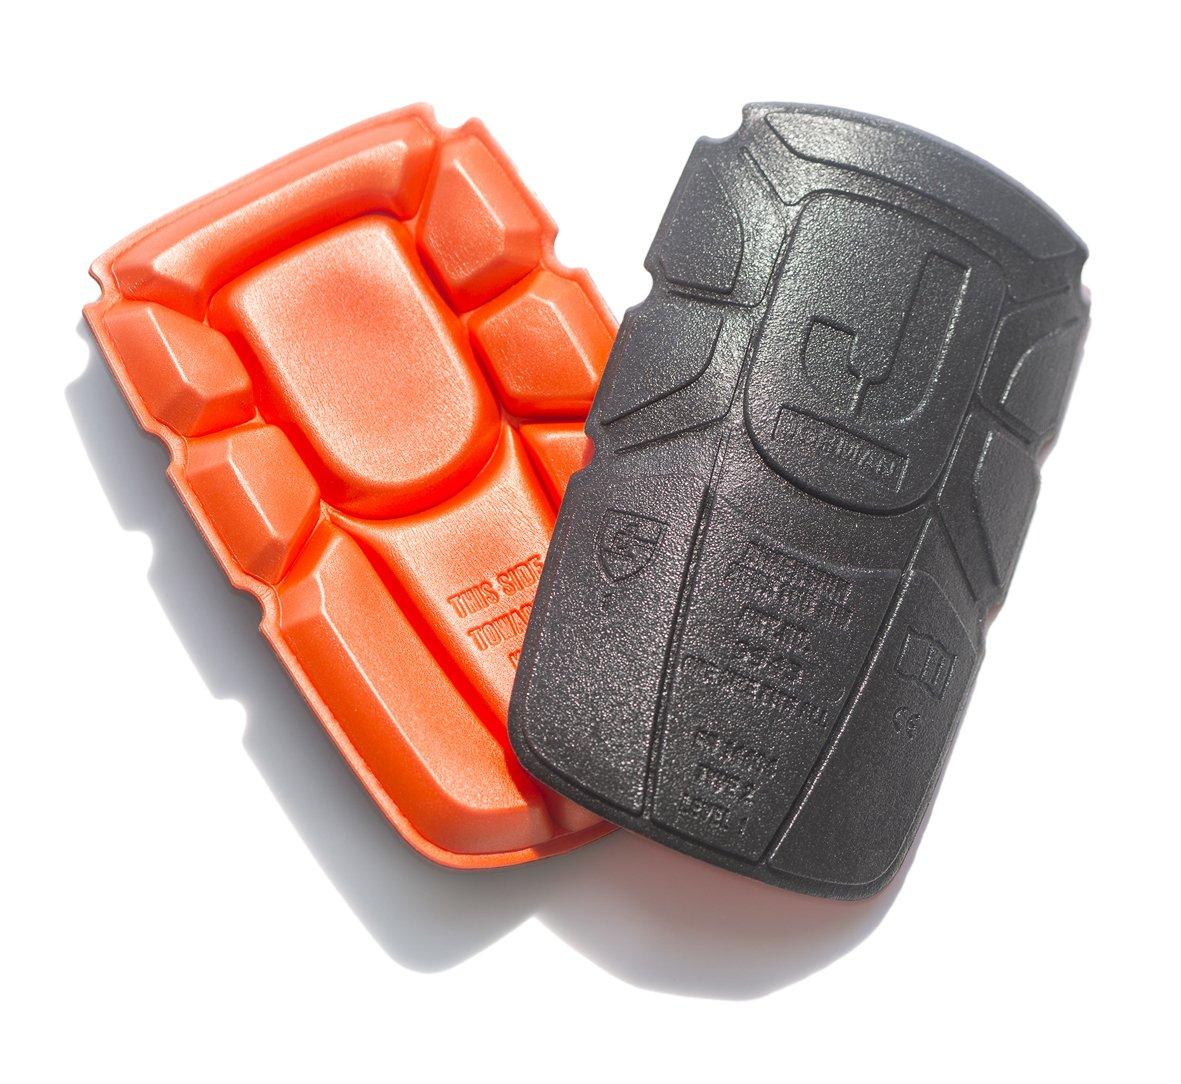 JOBMAN Workwear Men's Knee Pads, Orange/Black, One Size